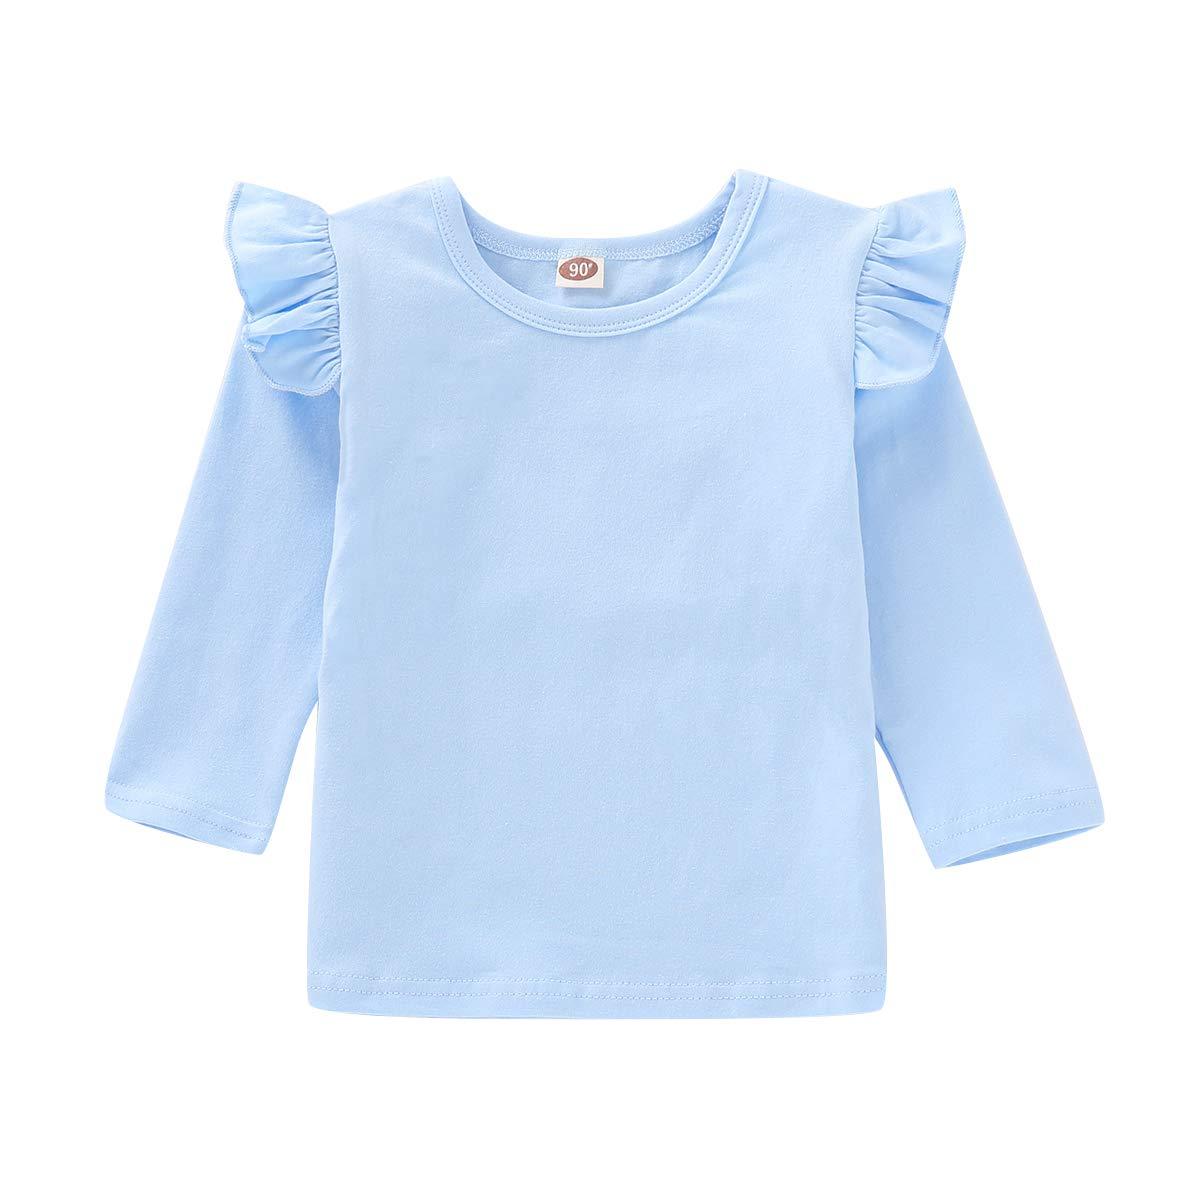 Floral Cross Overall Princess Dress 2Pcs Toddler Baby Ruffle Sleeve Overall Skirts Set Little Girls Cotton Shirts Top